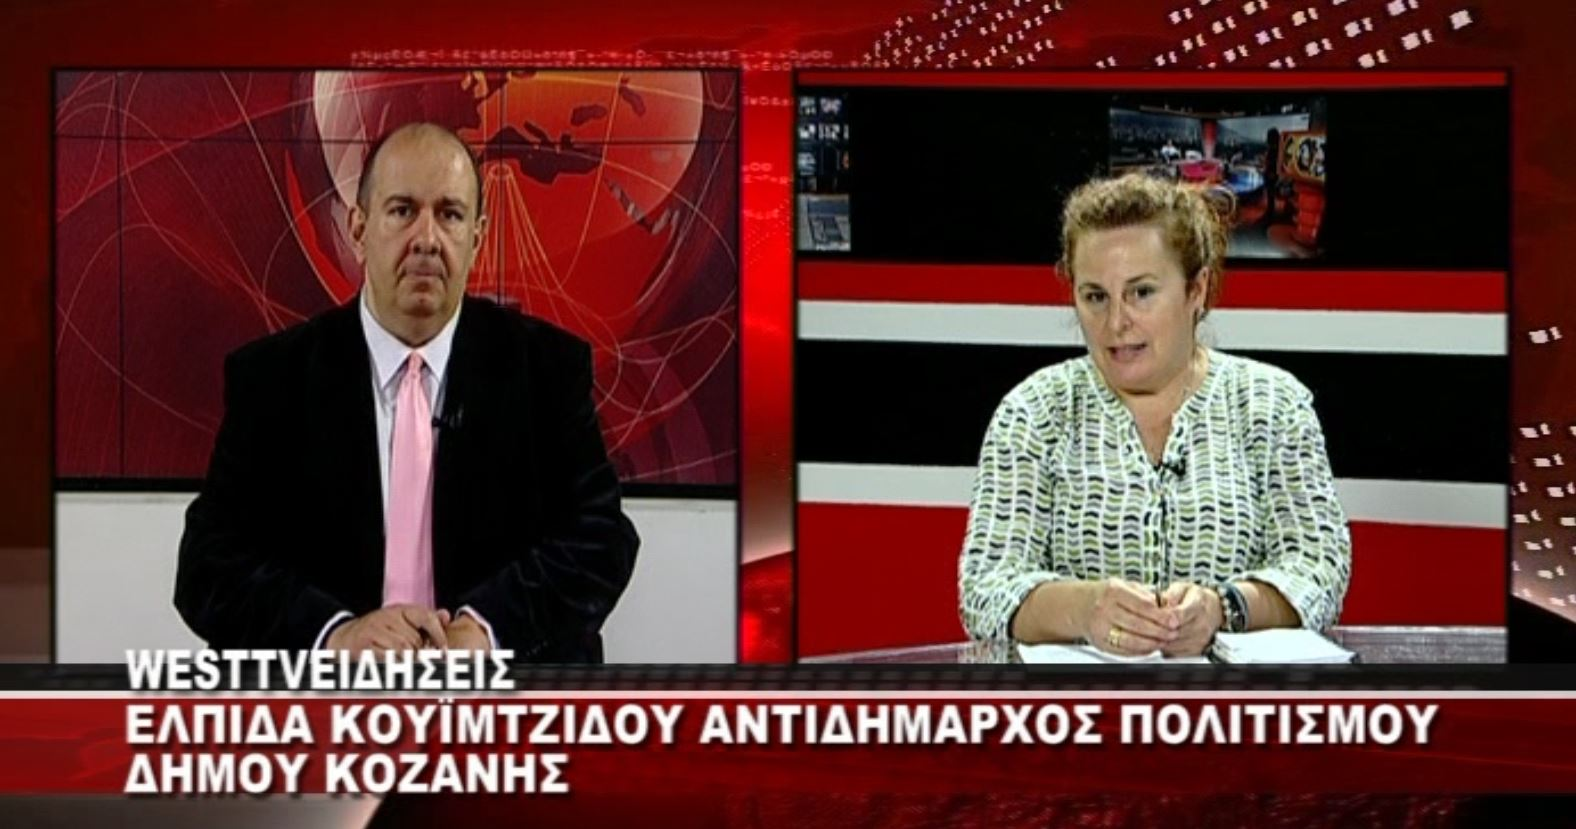 kozan.gr: Η Ελπίδα Κοϋμτζίδου απαντά στα παράπονα του δημιουργού του λογοτύπου – δημιουργικού των Λασσανείων του 2018, Σωτήρη Σιουτζιούκη, ο οποίος διαμαρτυρήθηκε για τ' ότι ο ΟΑΠΝ χρησιμοποίησε για το αντίστοιχο δημιουργικό, των Λασσανείων, του 2020, μια αναπροσαρμογή της δικής του δουλειάς, χωρίς να τον έχει ενημερώσει κανείς (Βίντεο)